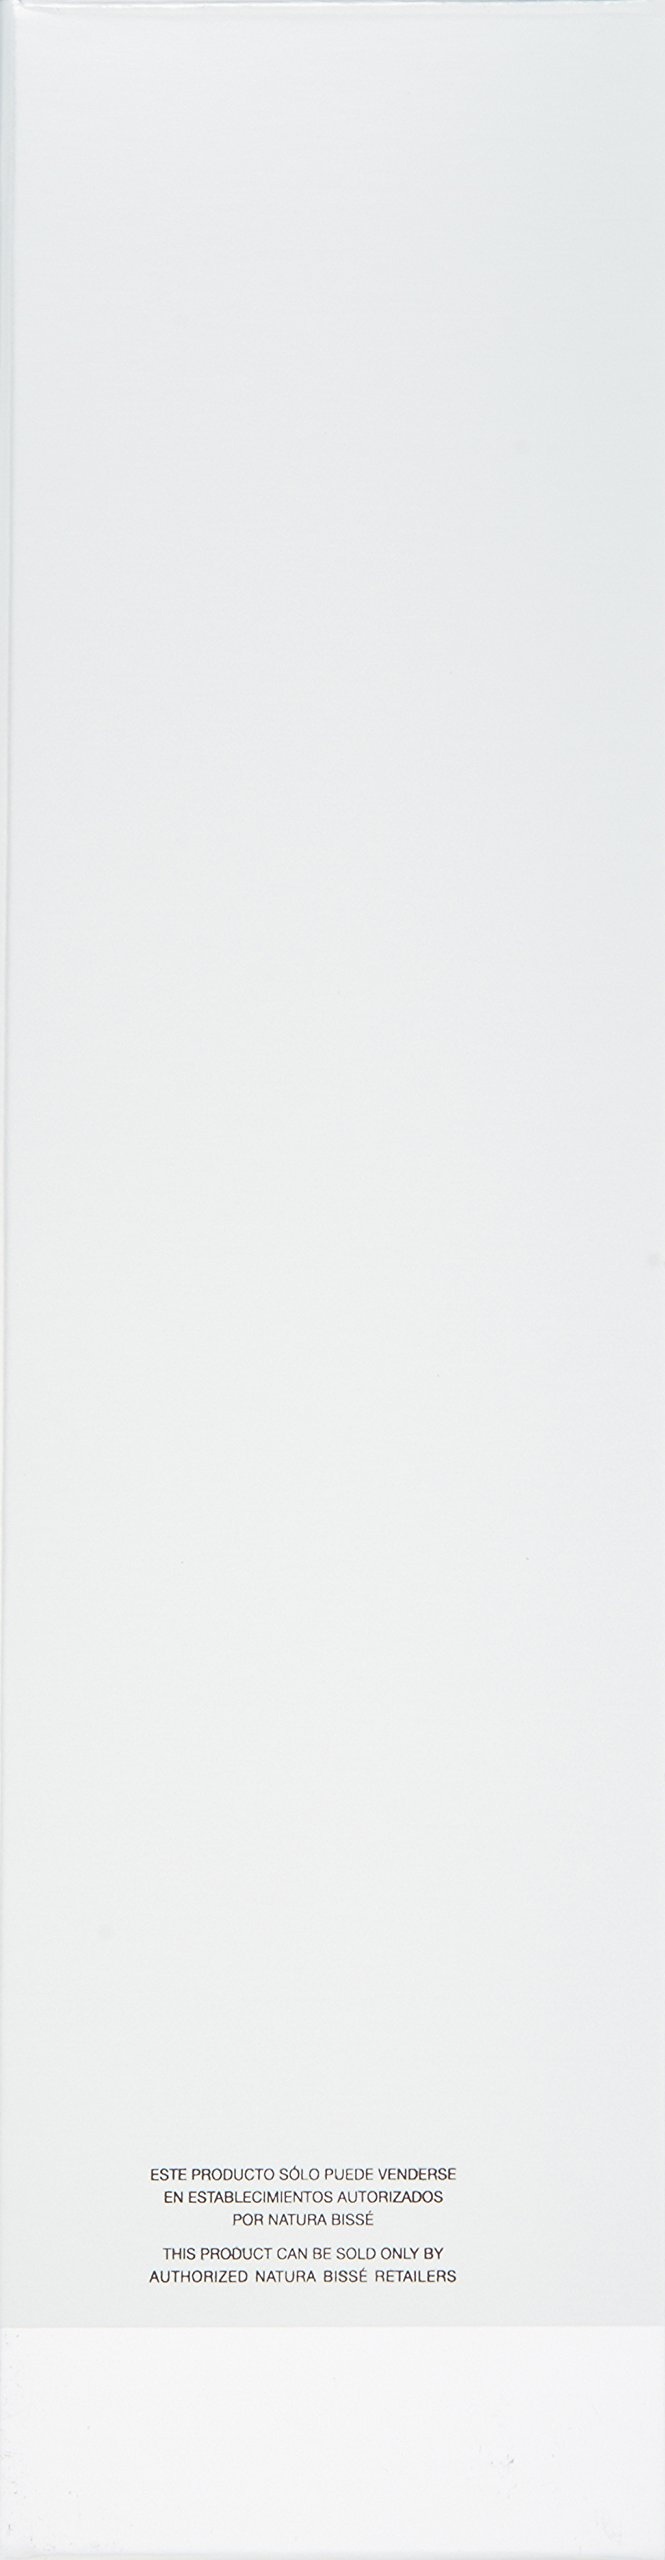 Natura Bisse Diamond White Clarity Toning Lotion, 7.0 fl. oz. by Natura Bisse (Image #7)